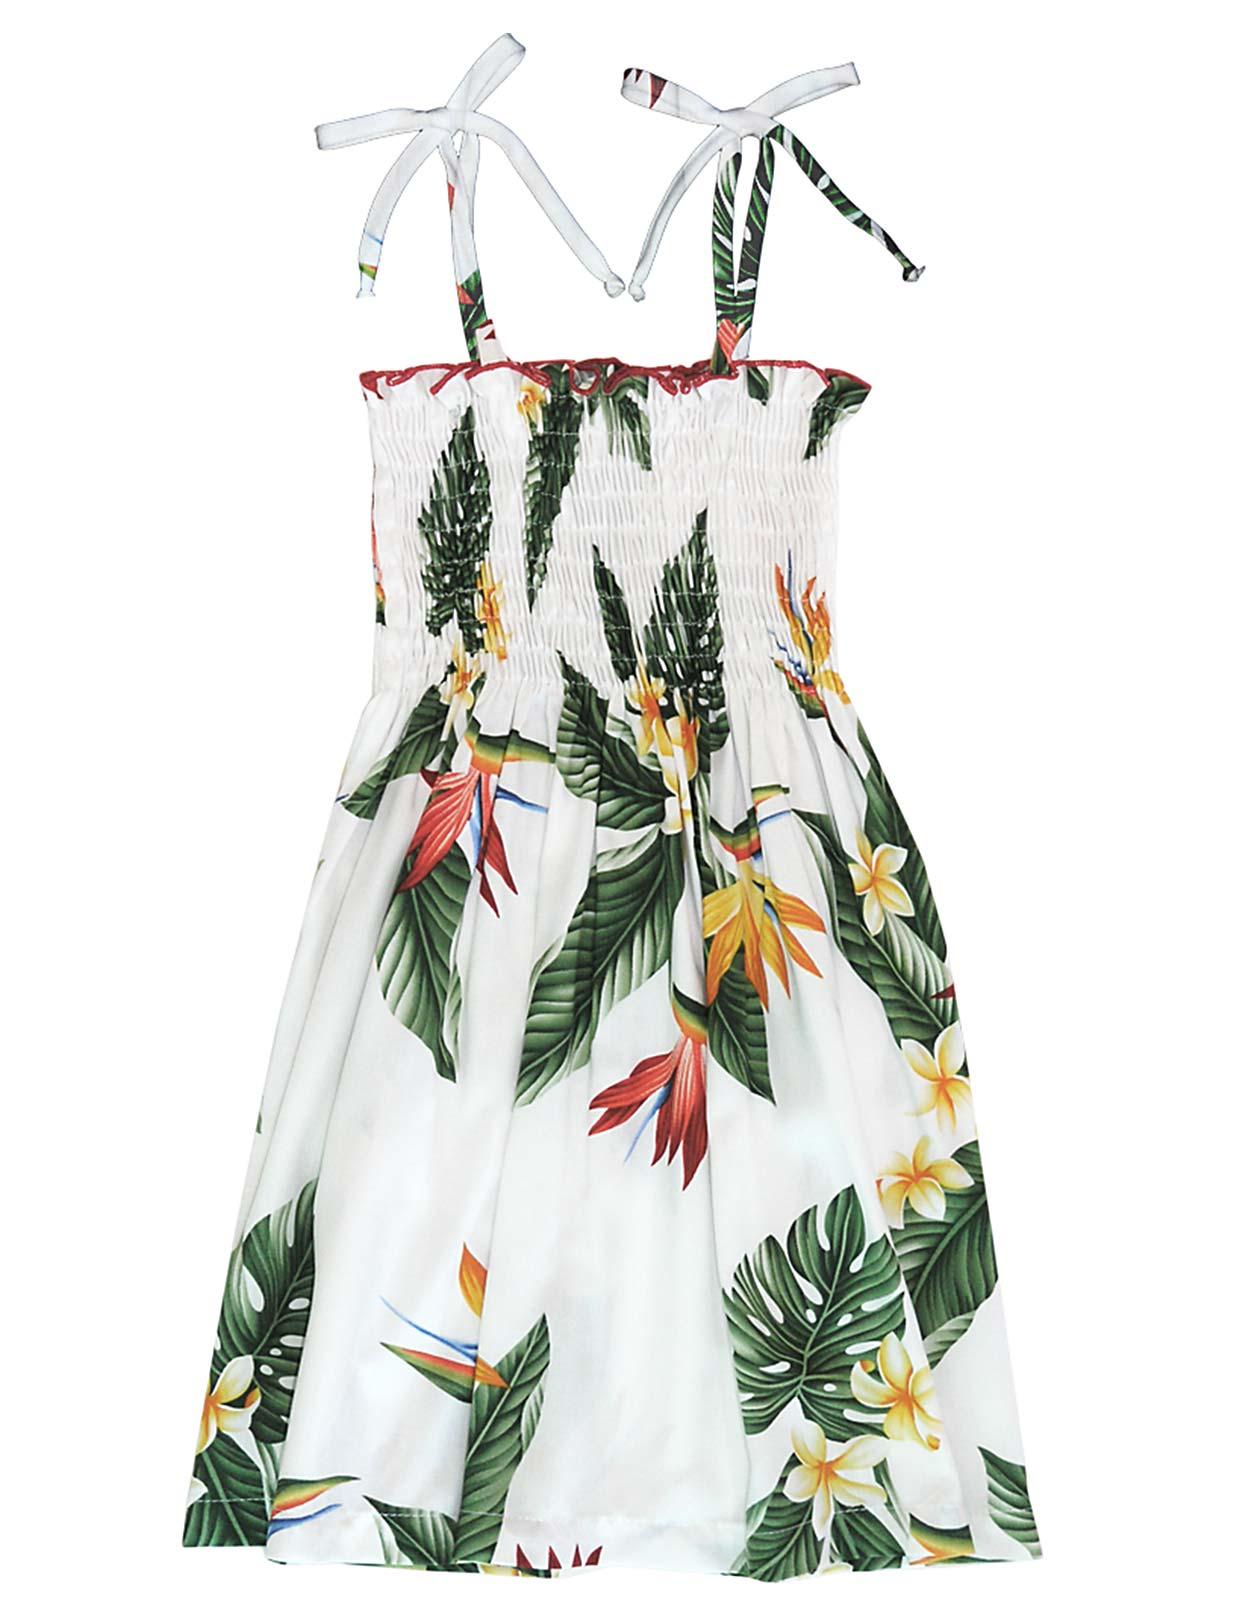 Clothing stores paradise ca